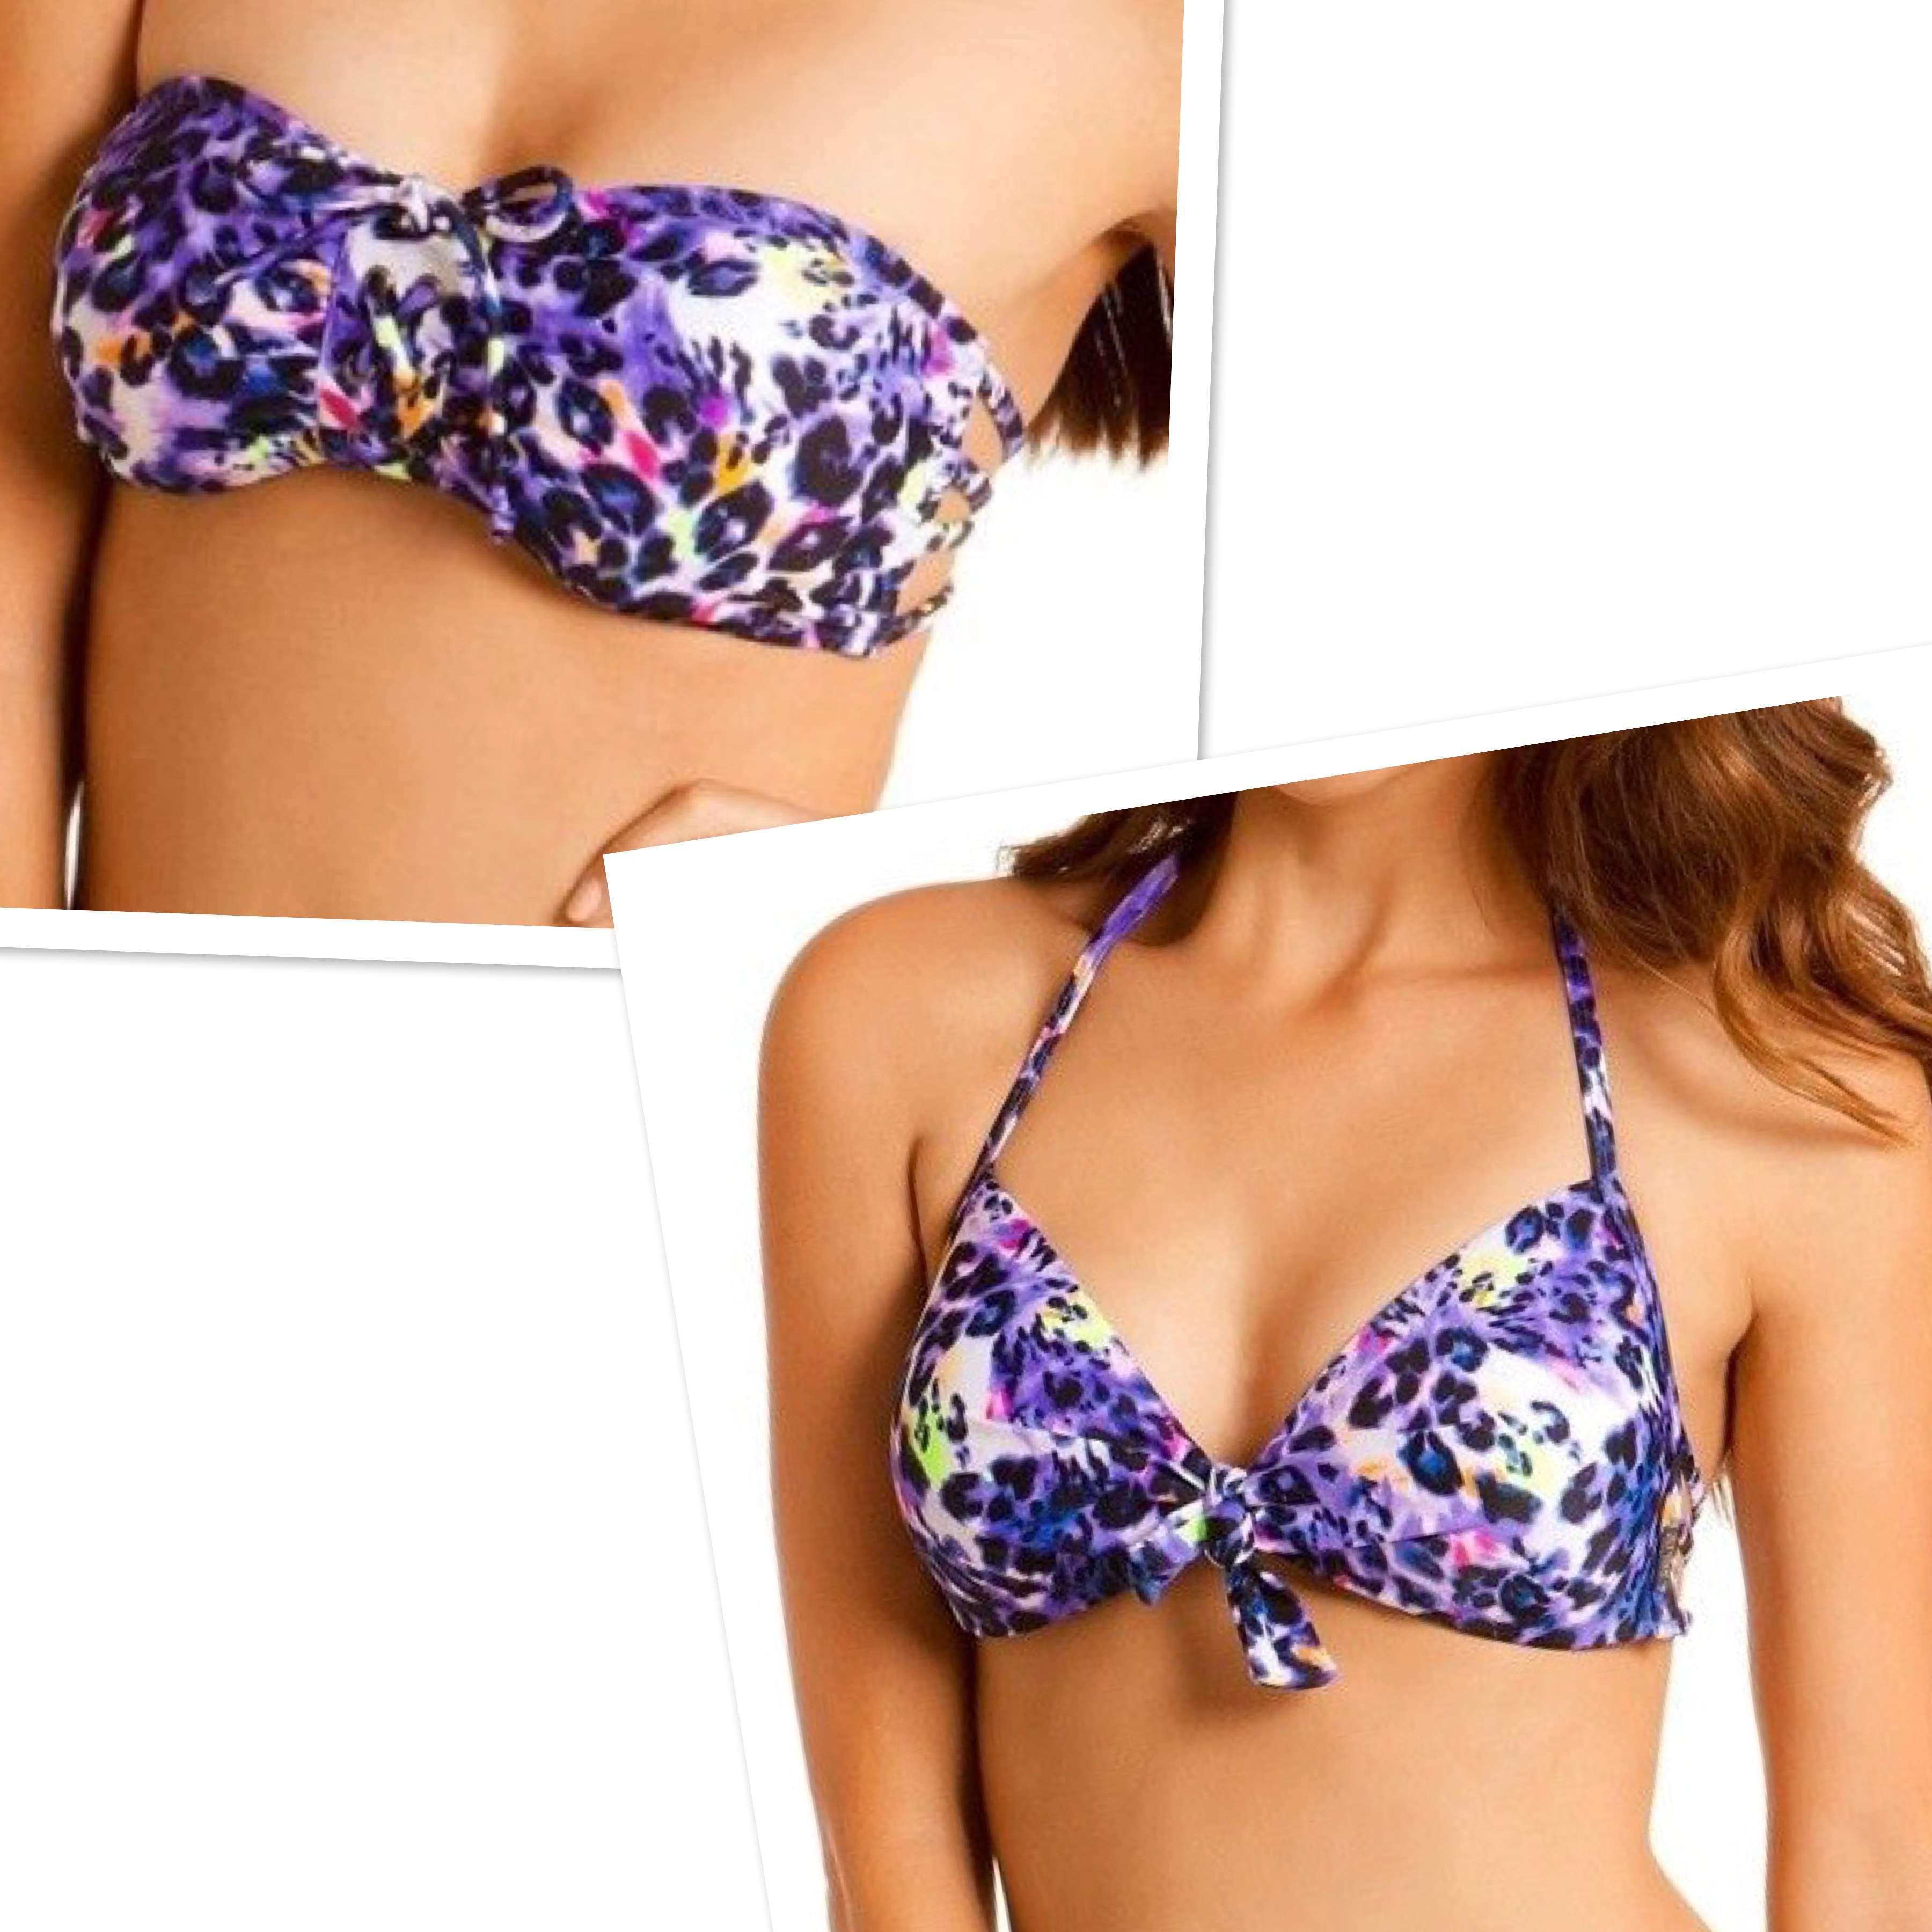 Bikini Tops Size 16 $19.95 Designer 2Chillies Swimsuit